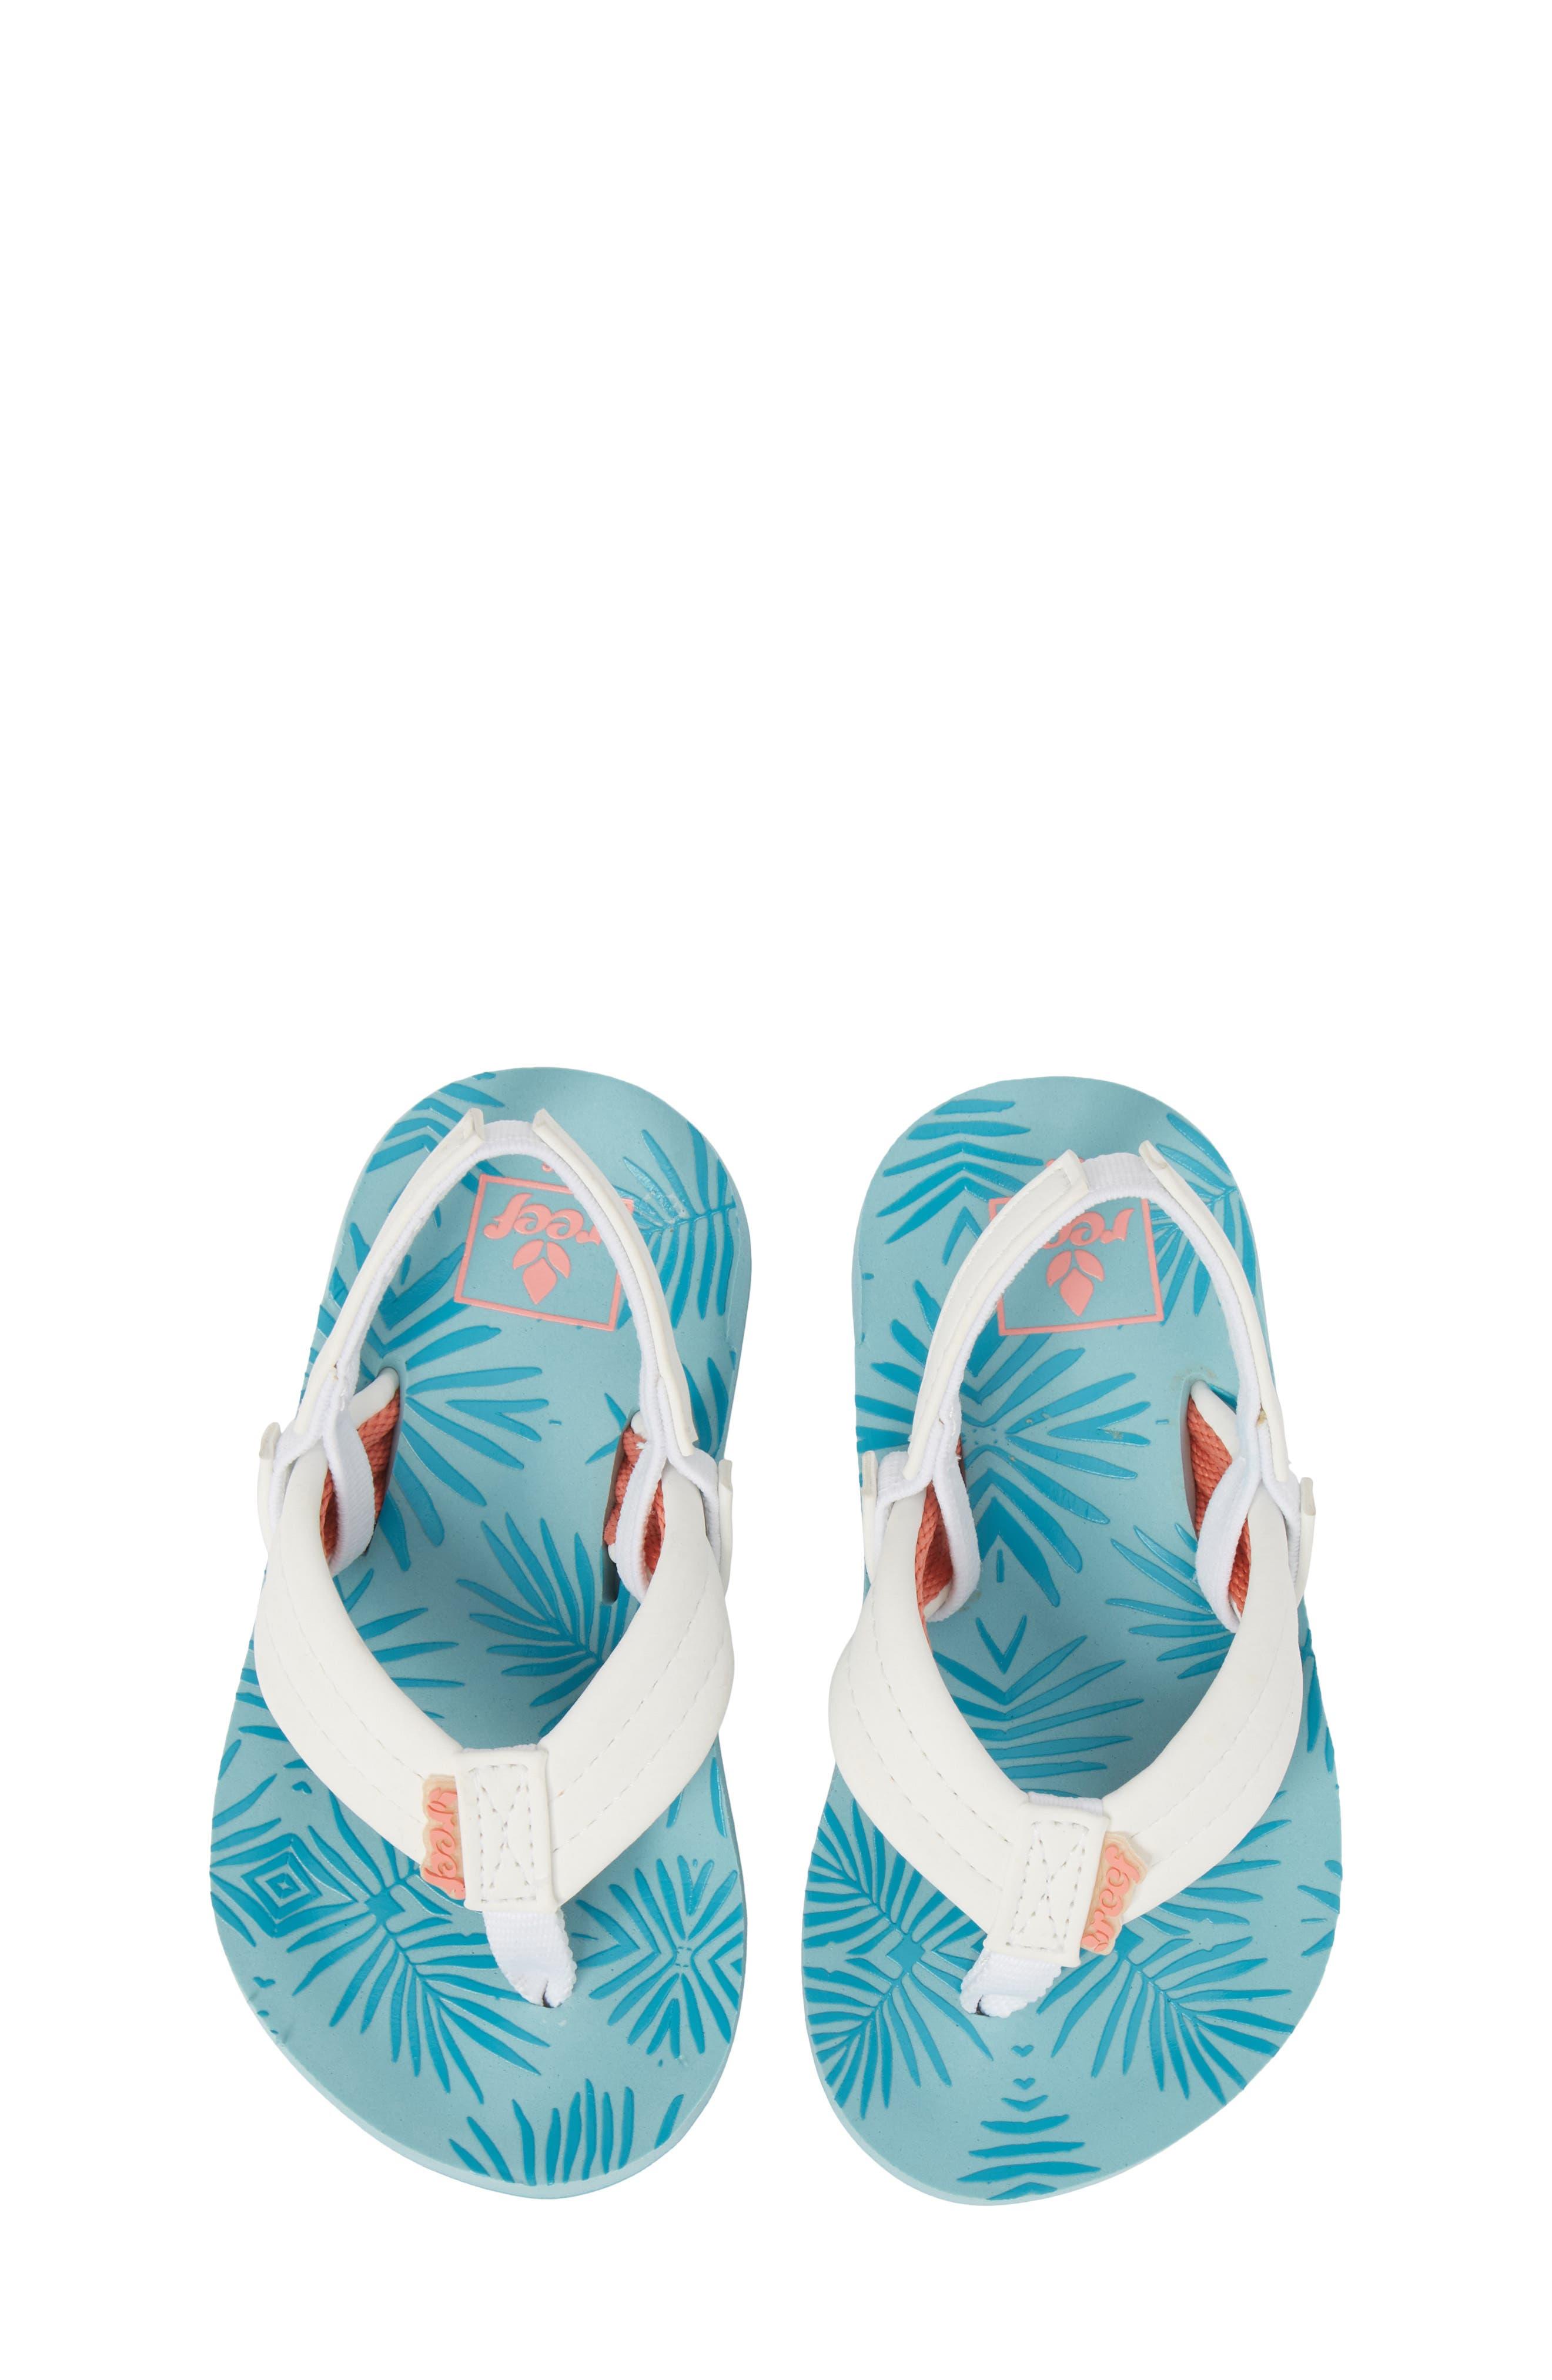 Little Reef Footprints Sandal,                         Main,                         color, Blue